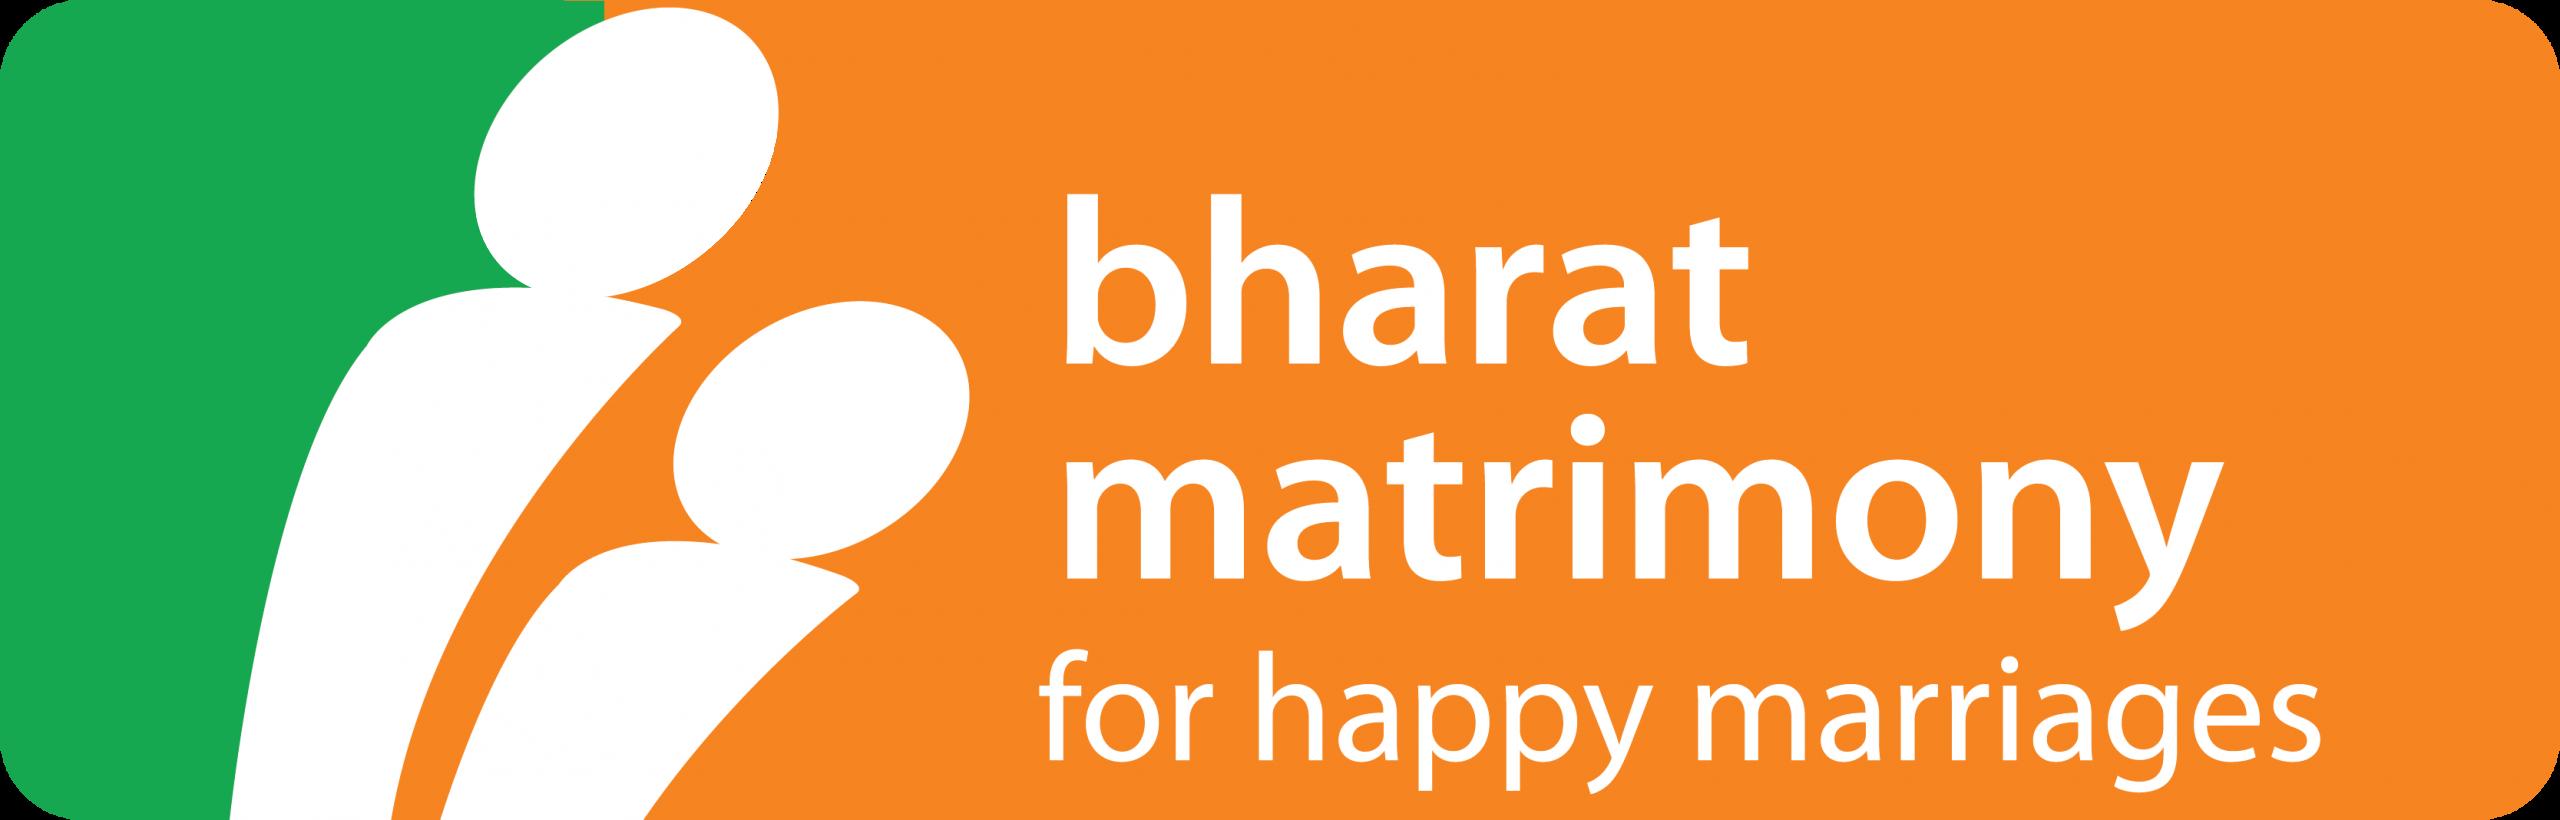 bharatmatrimony logo